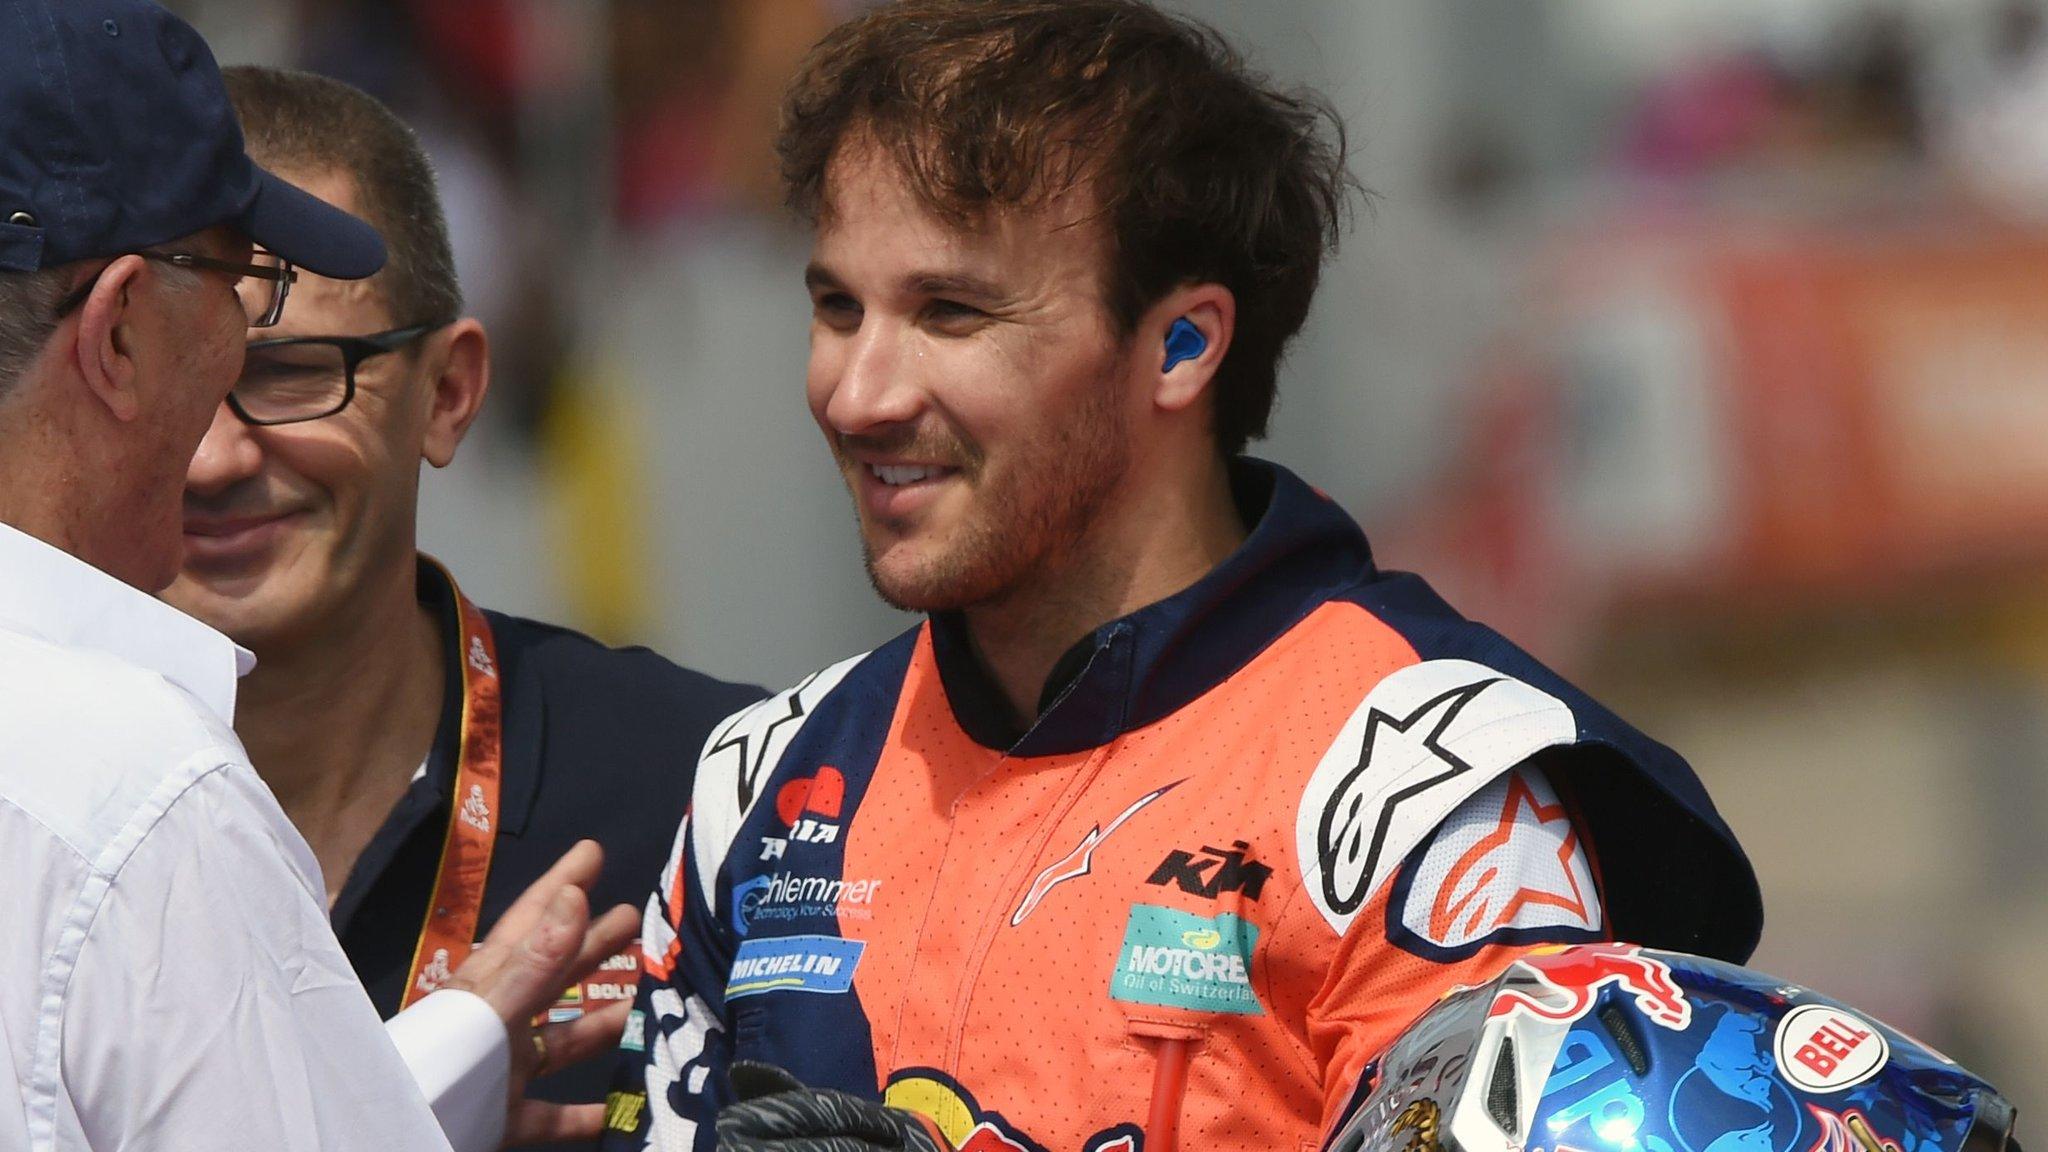 Sam Sunderland: British rider continues recovery after Dakar Rally injury